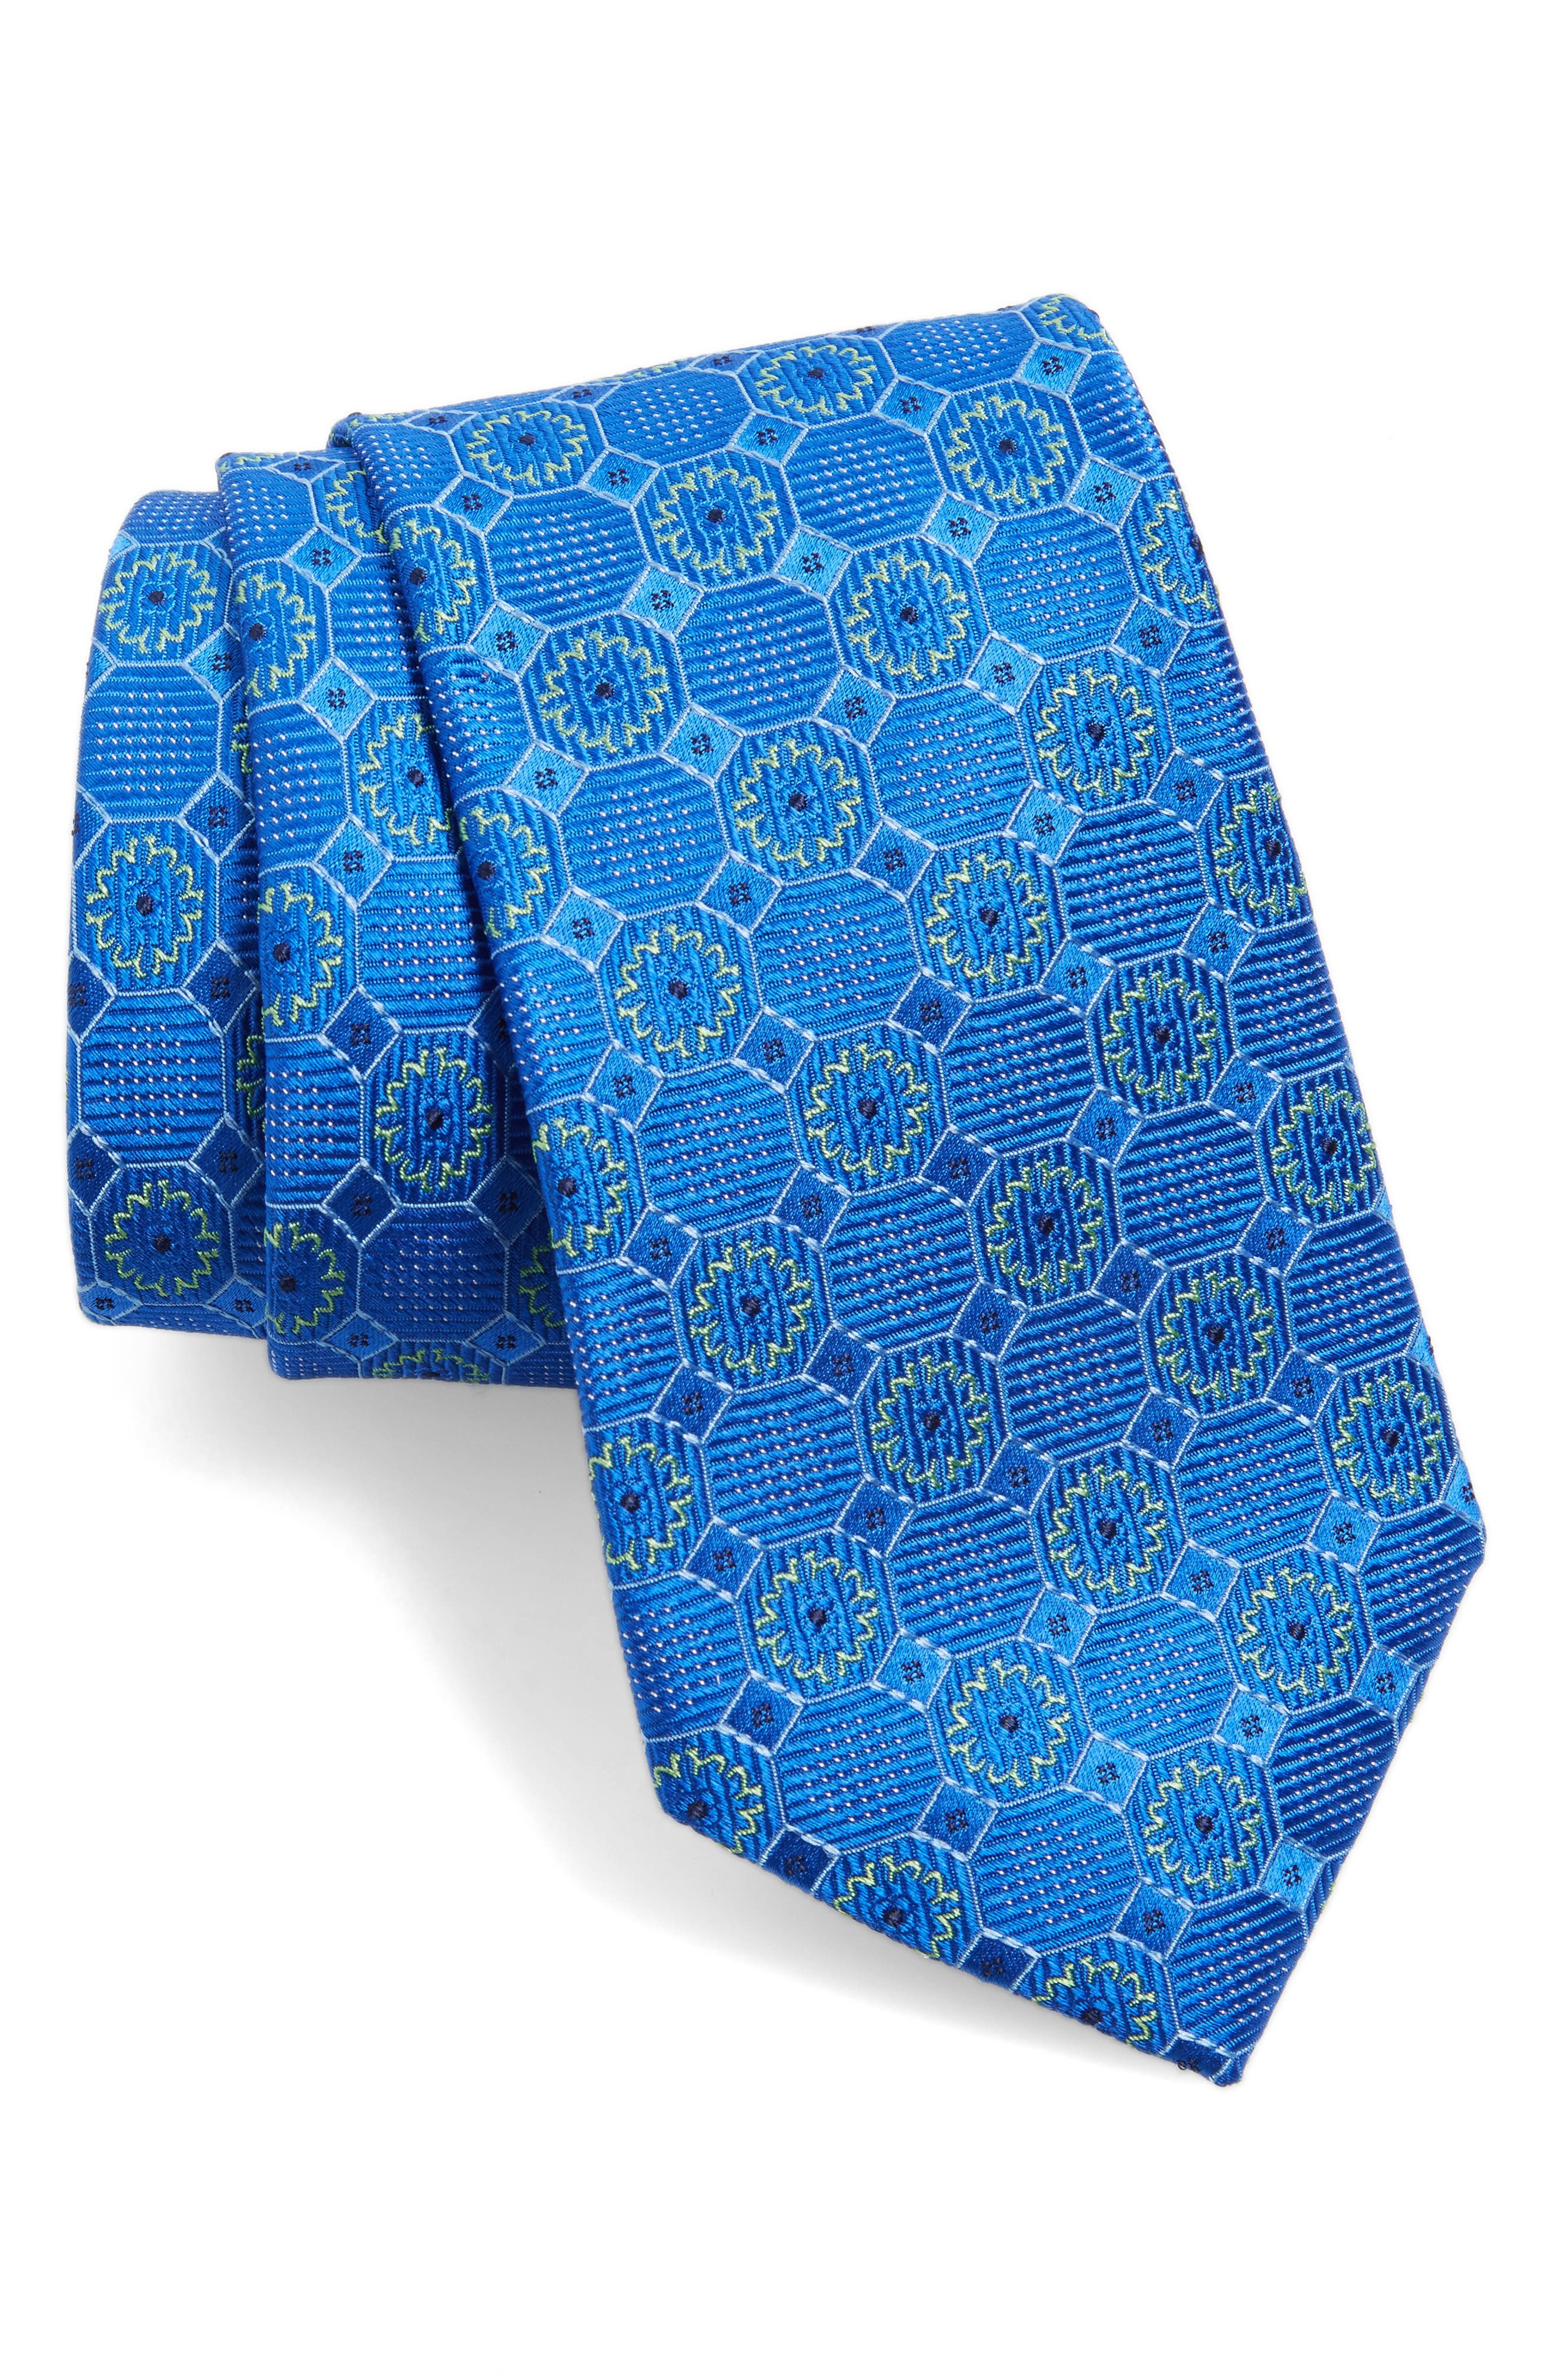 Main Image - Nordstrom Men's Shop Medallion Silk Tie